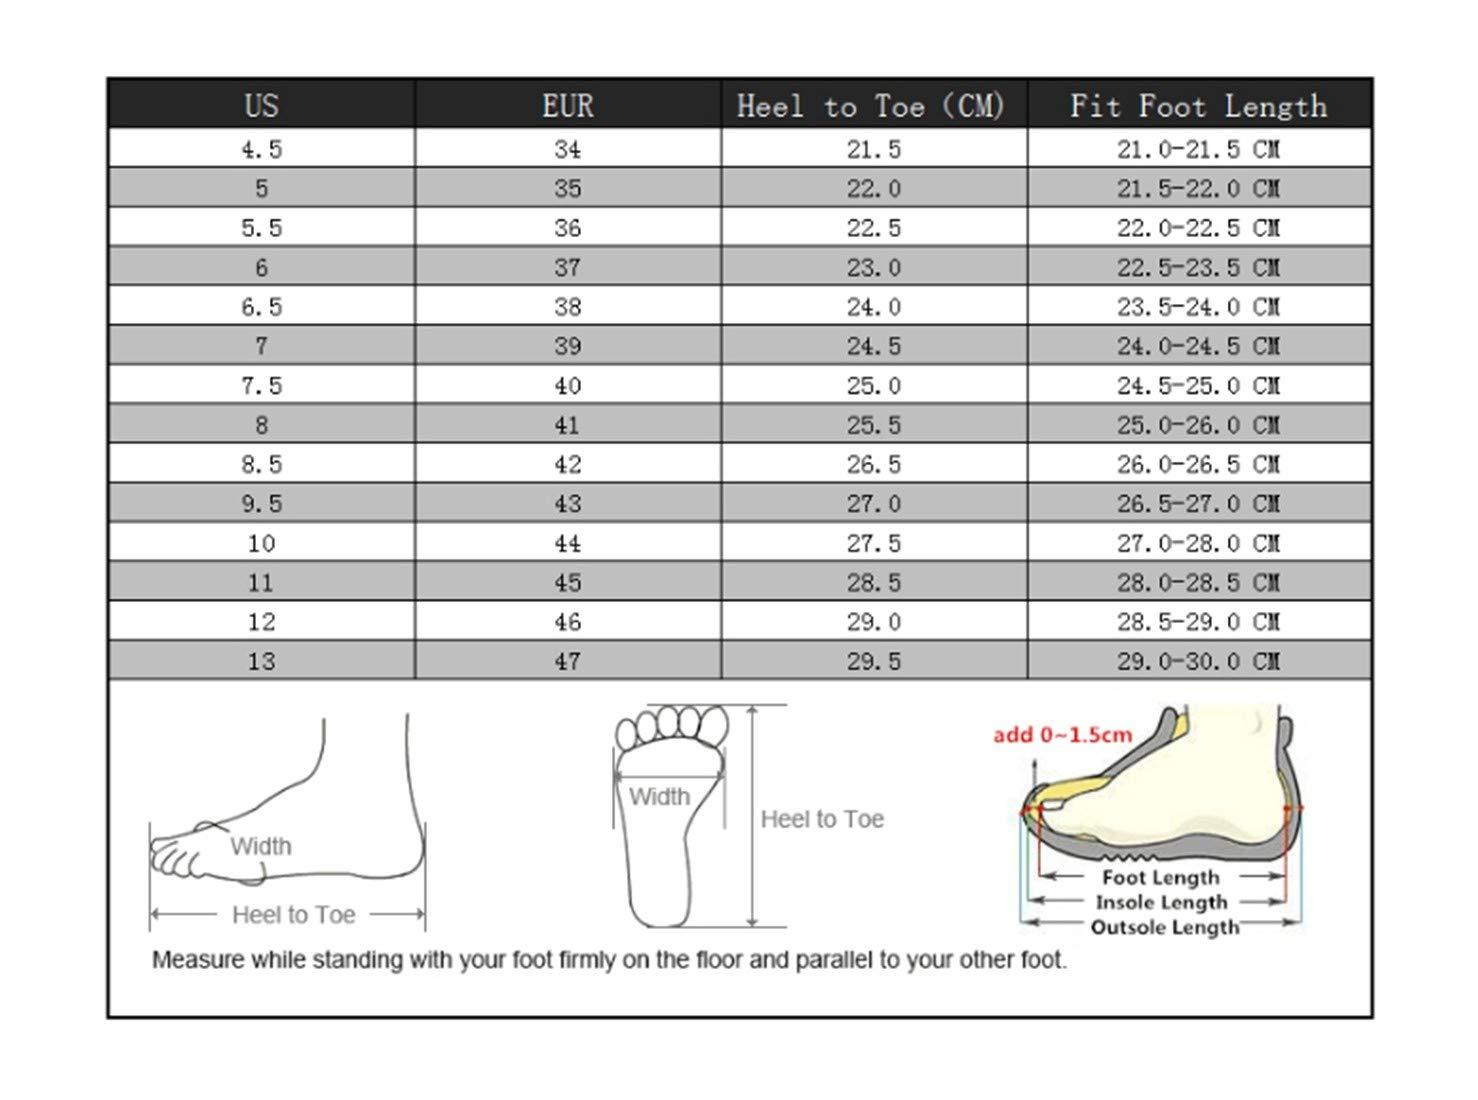 YAYADI Damenschuhe Damenschuhe Damenschuhe Turnschuhe Mode Atmungsaktive Casual Trainer Jogging Fitness Schuhe Leichte Yoga Reiten Reisen Outdoor Produkte dbcfe2